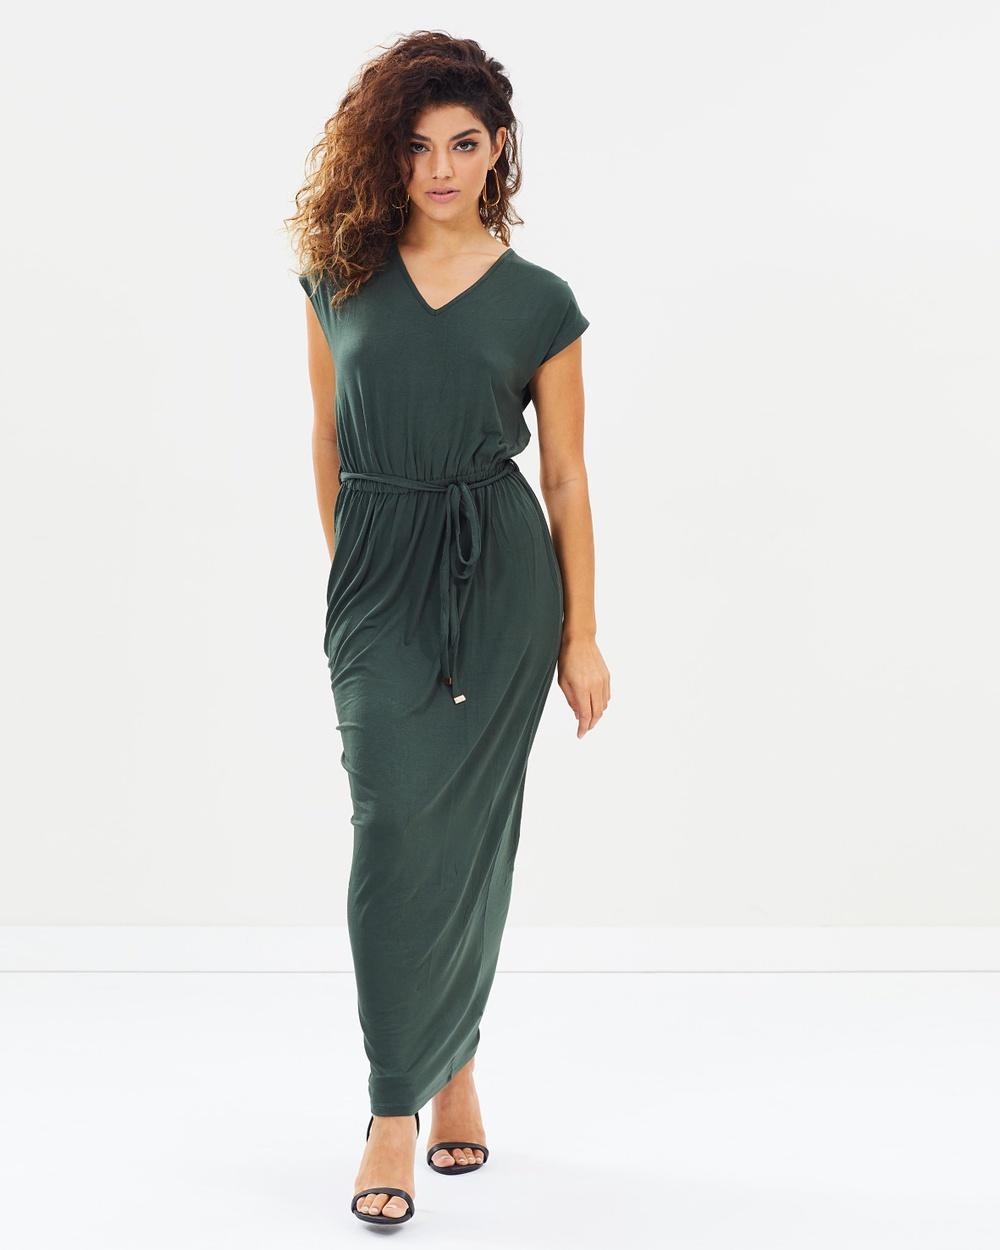 DP Petite Crochet Back Maxi Dress Dresses Green Crochet Back Maxi Dress